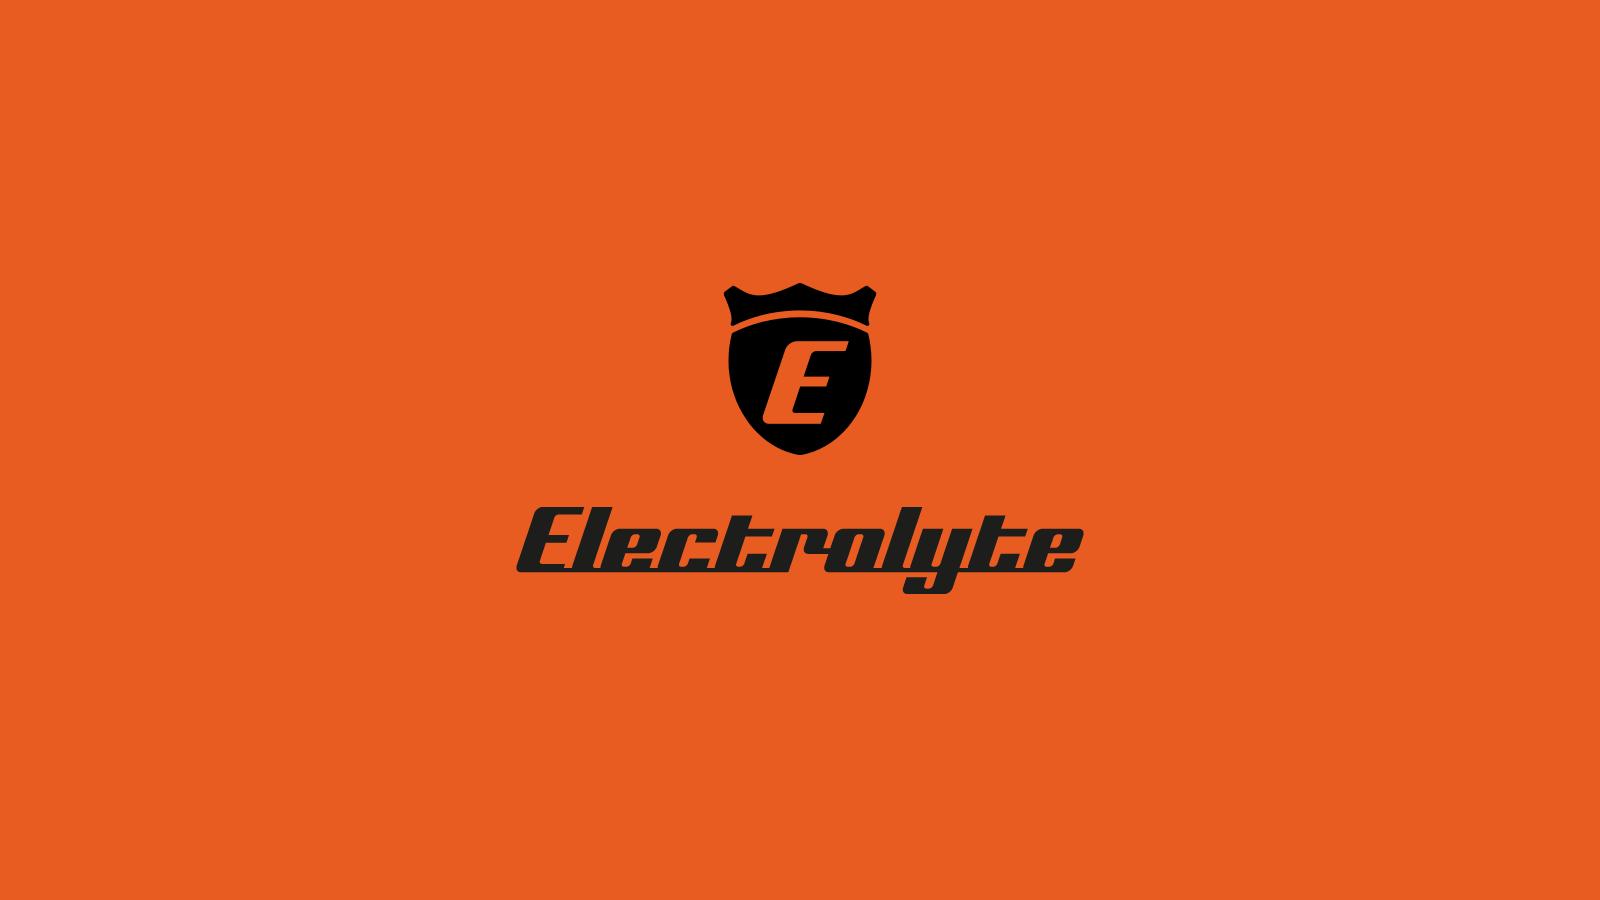 Electrolyte - das Logo